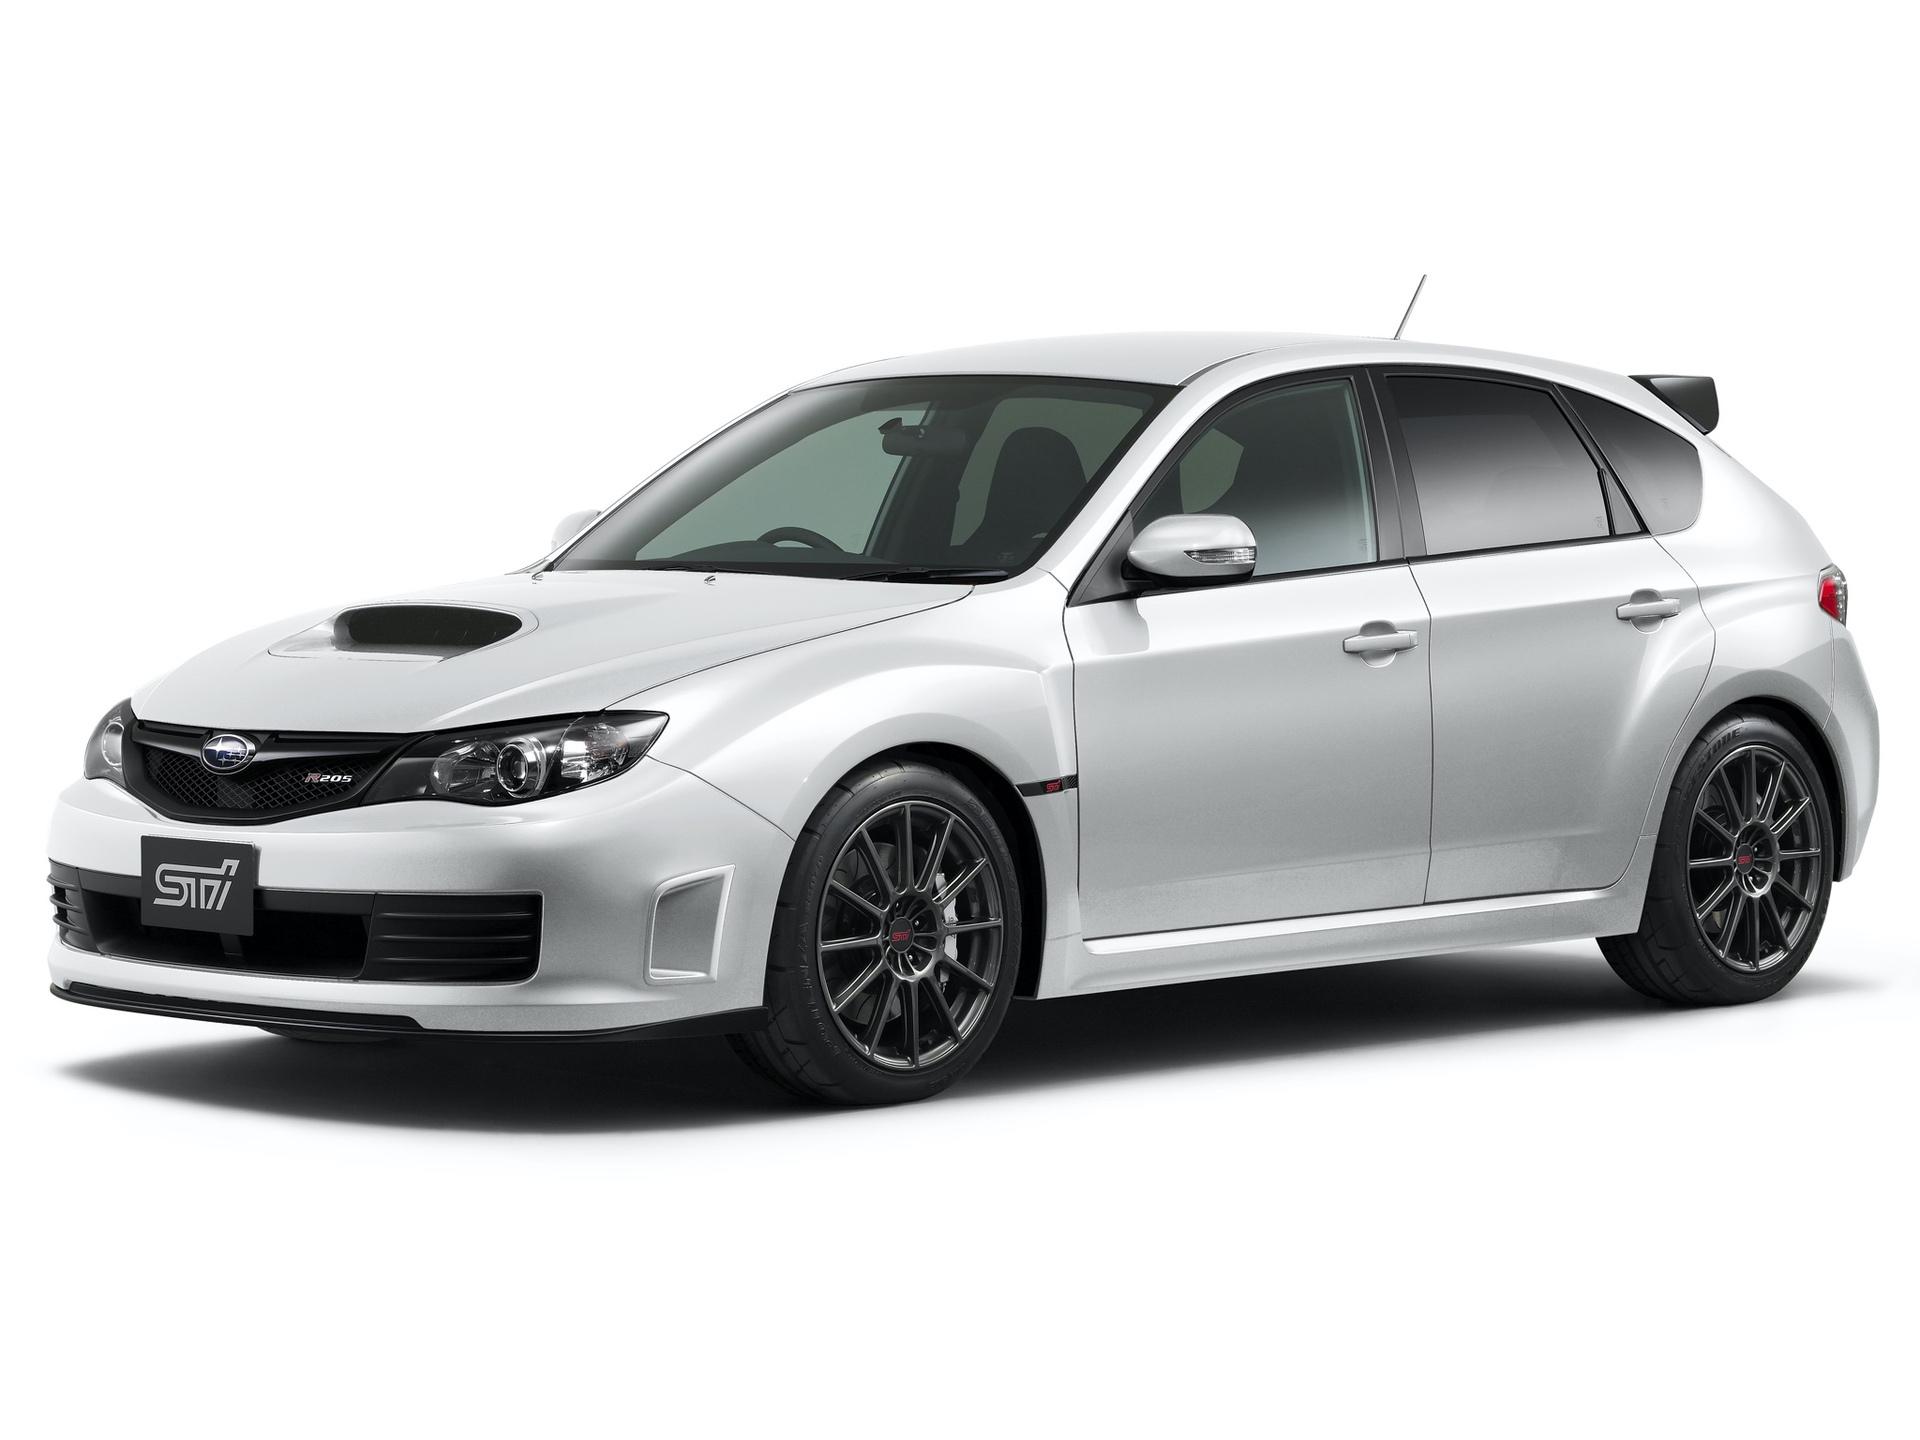 Subaru_Impreza_STI_R205_0000